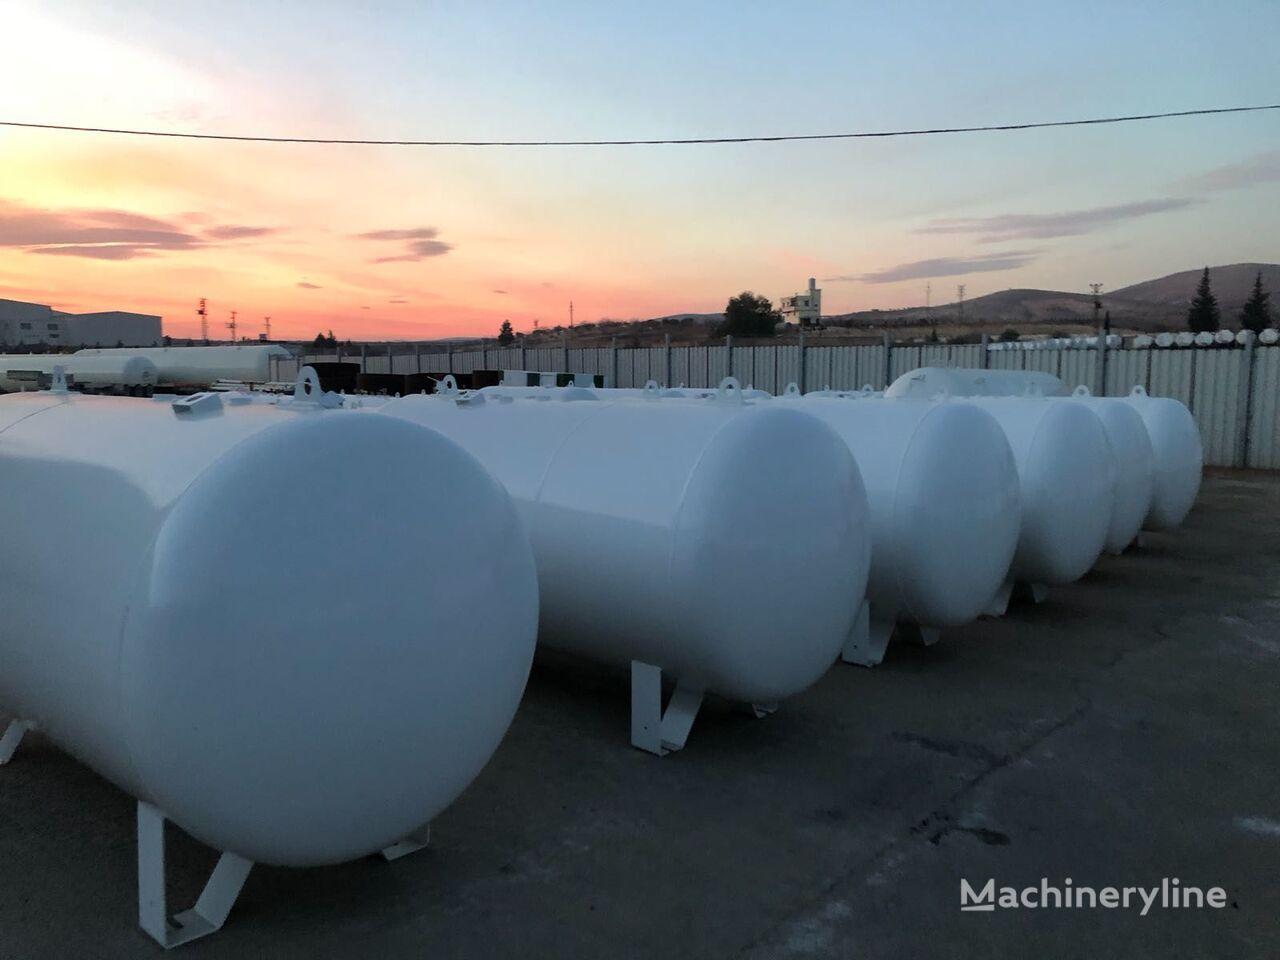 naujas dujų cisterna Micansan 2020 MODEL 10 M3 LPG STORAGES FULL ACCESORIES